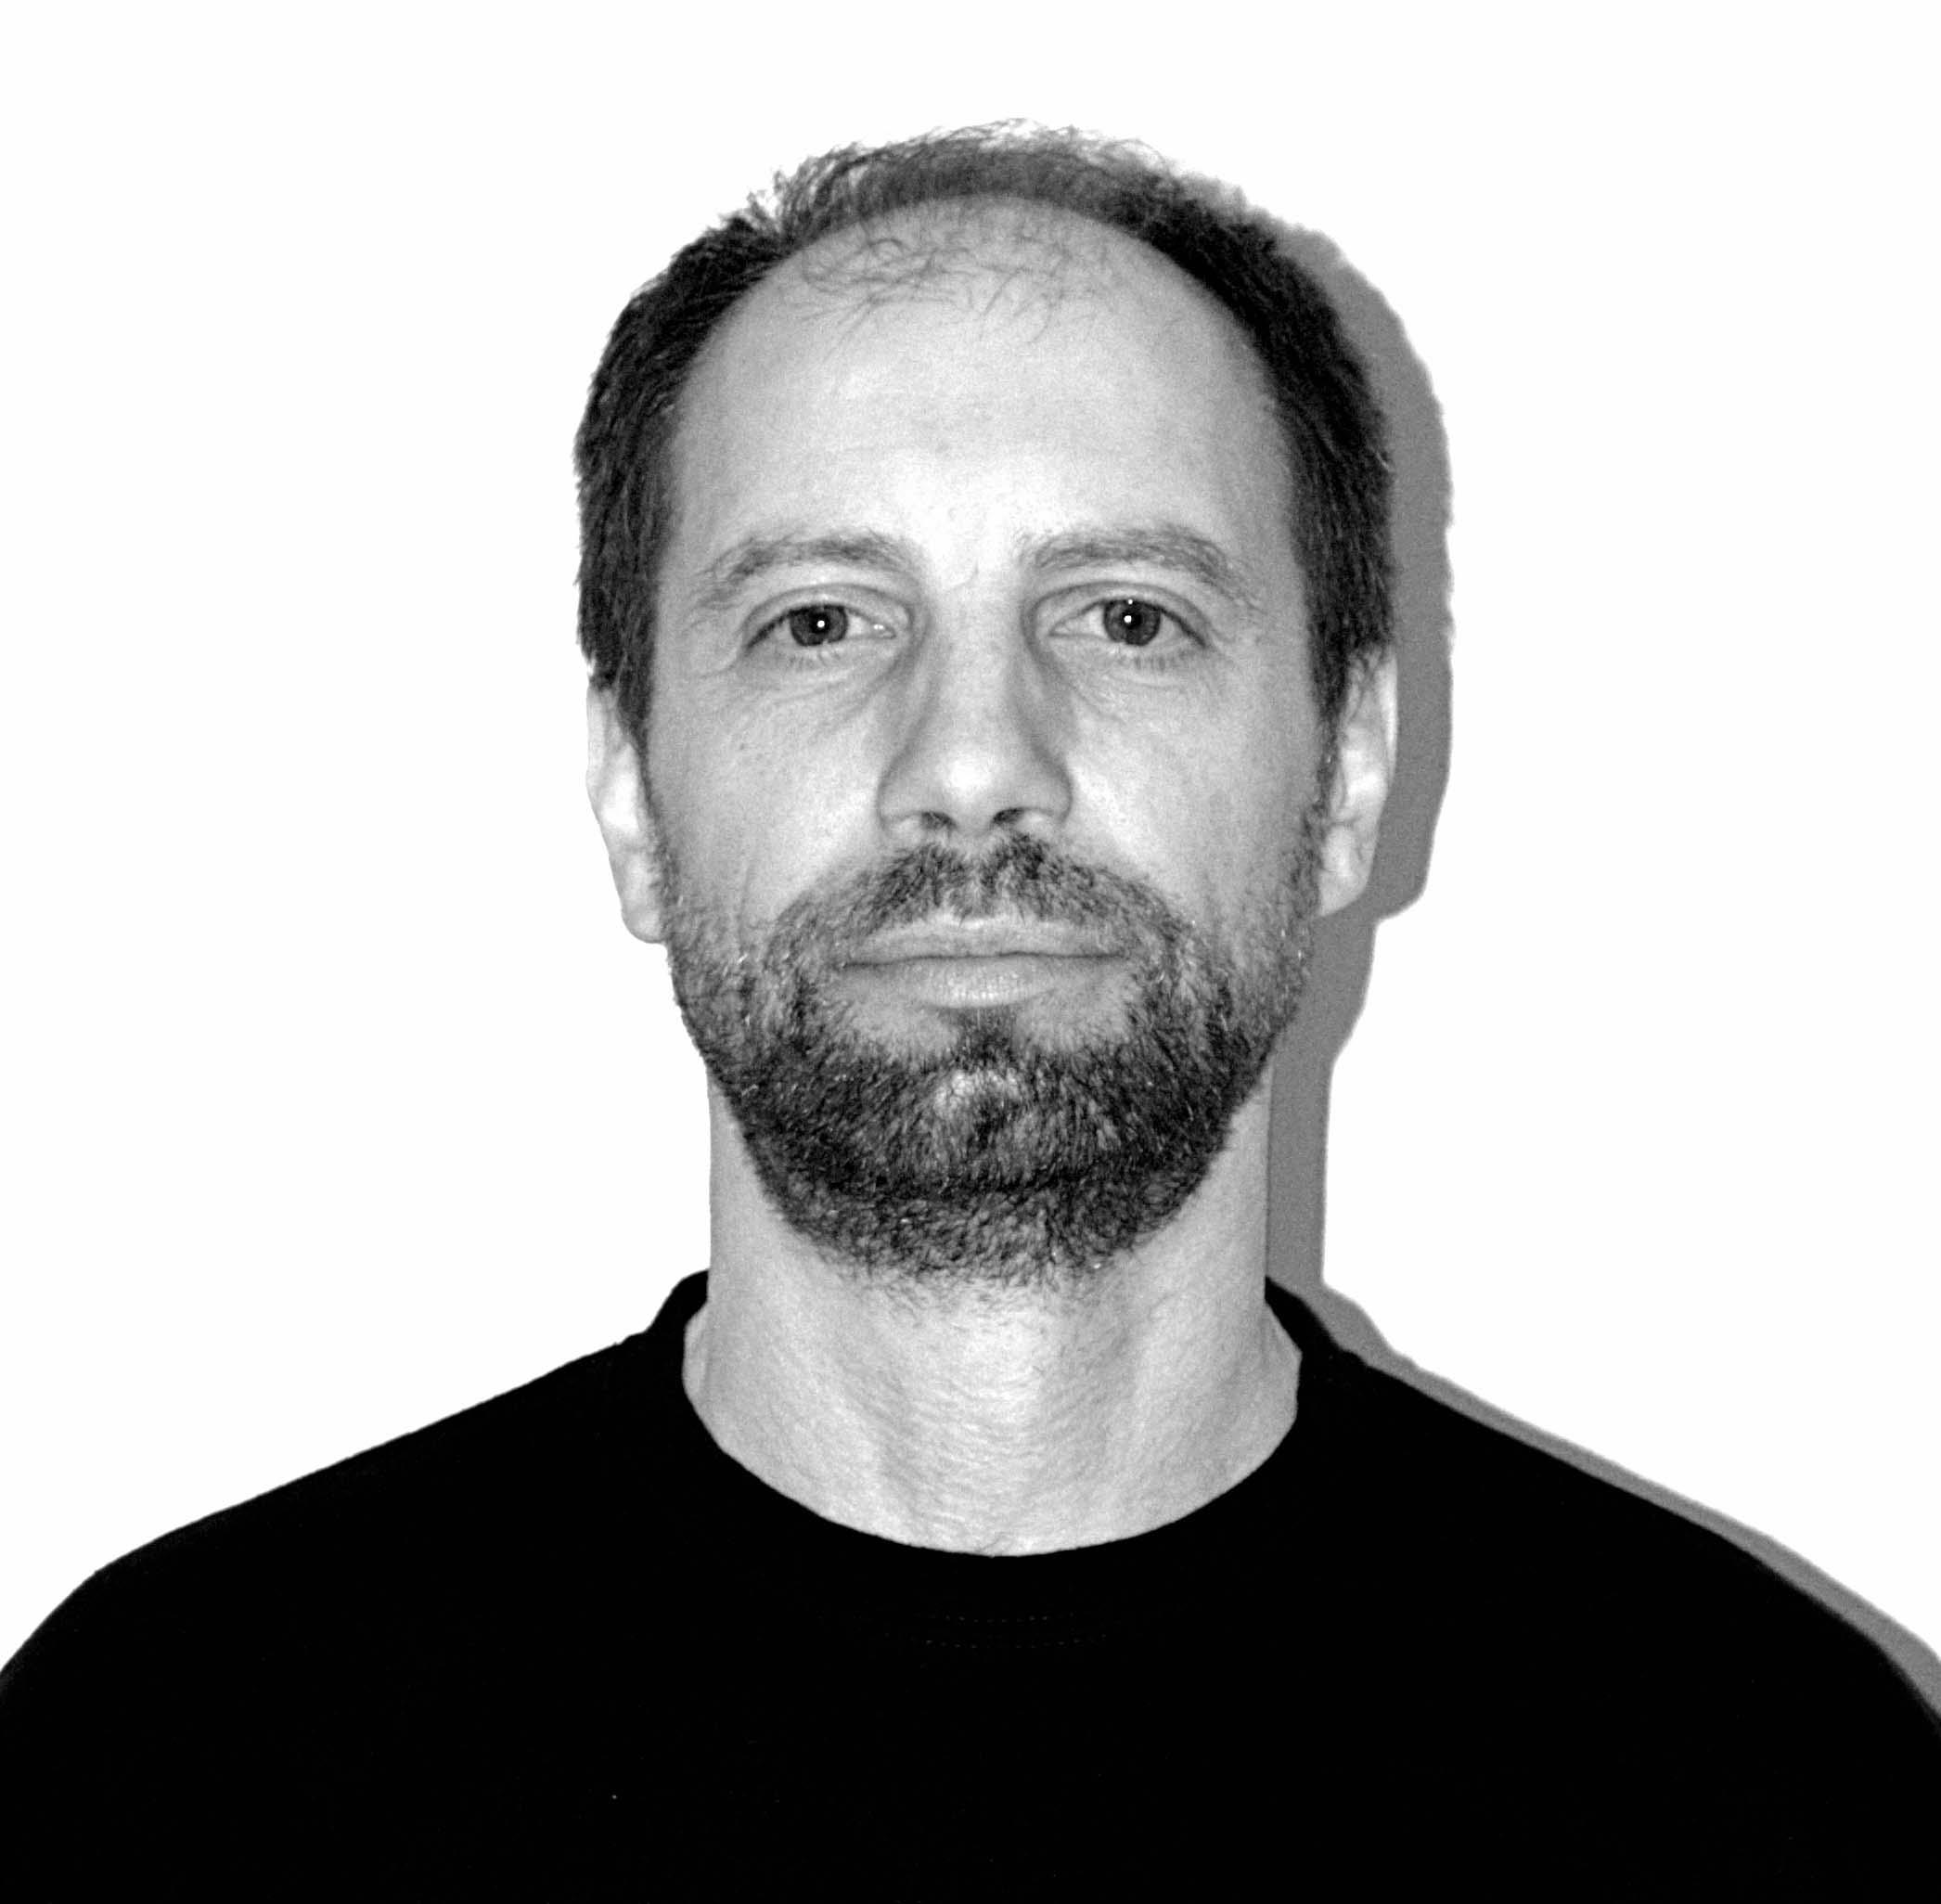 Thierry Pividori, Basso